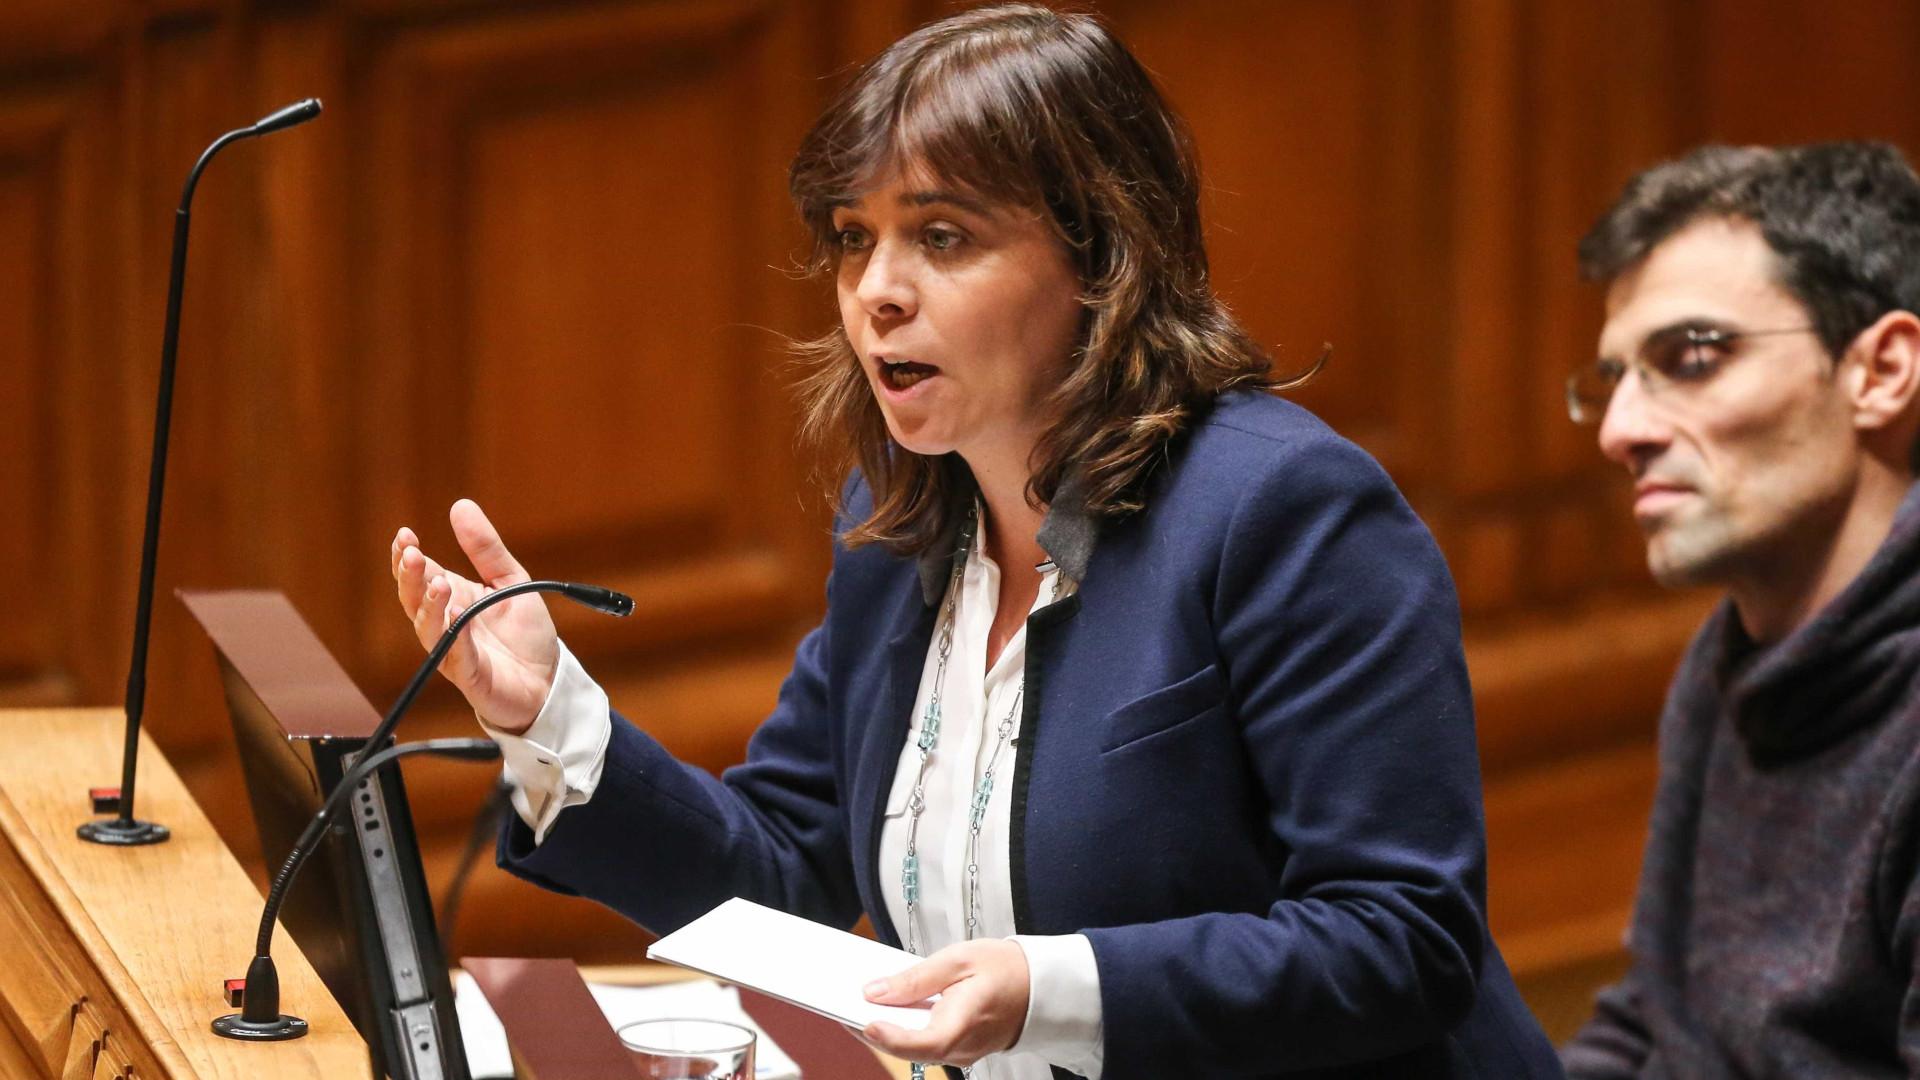 Bloco chama presidente do IEFP ao parlamento sobre falsos recibos verdes